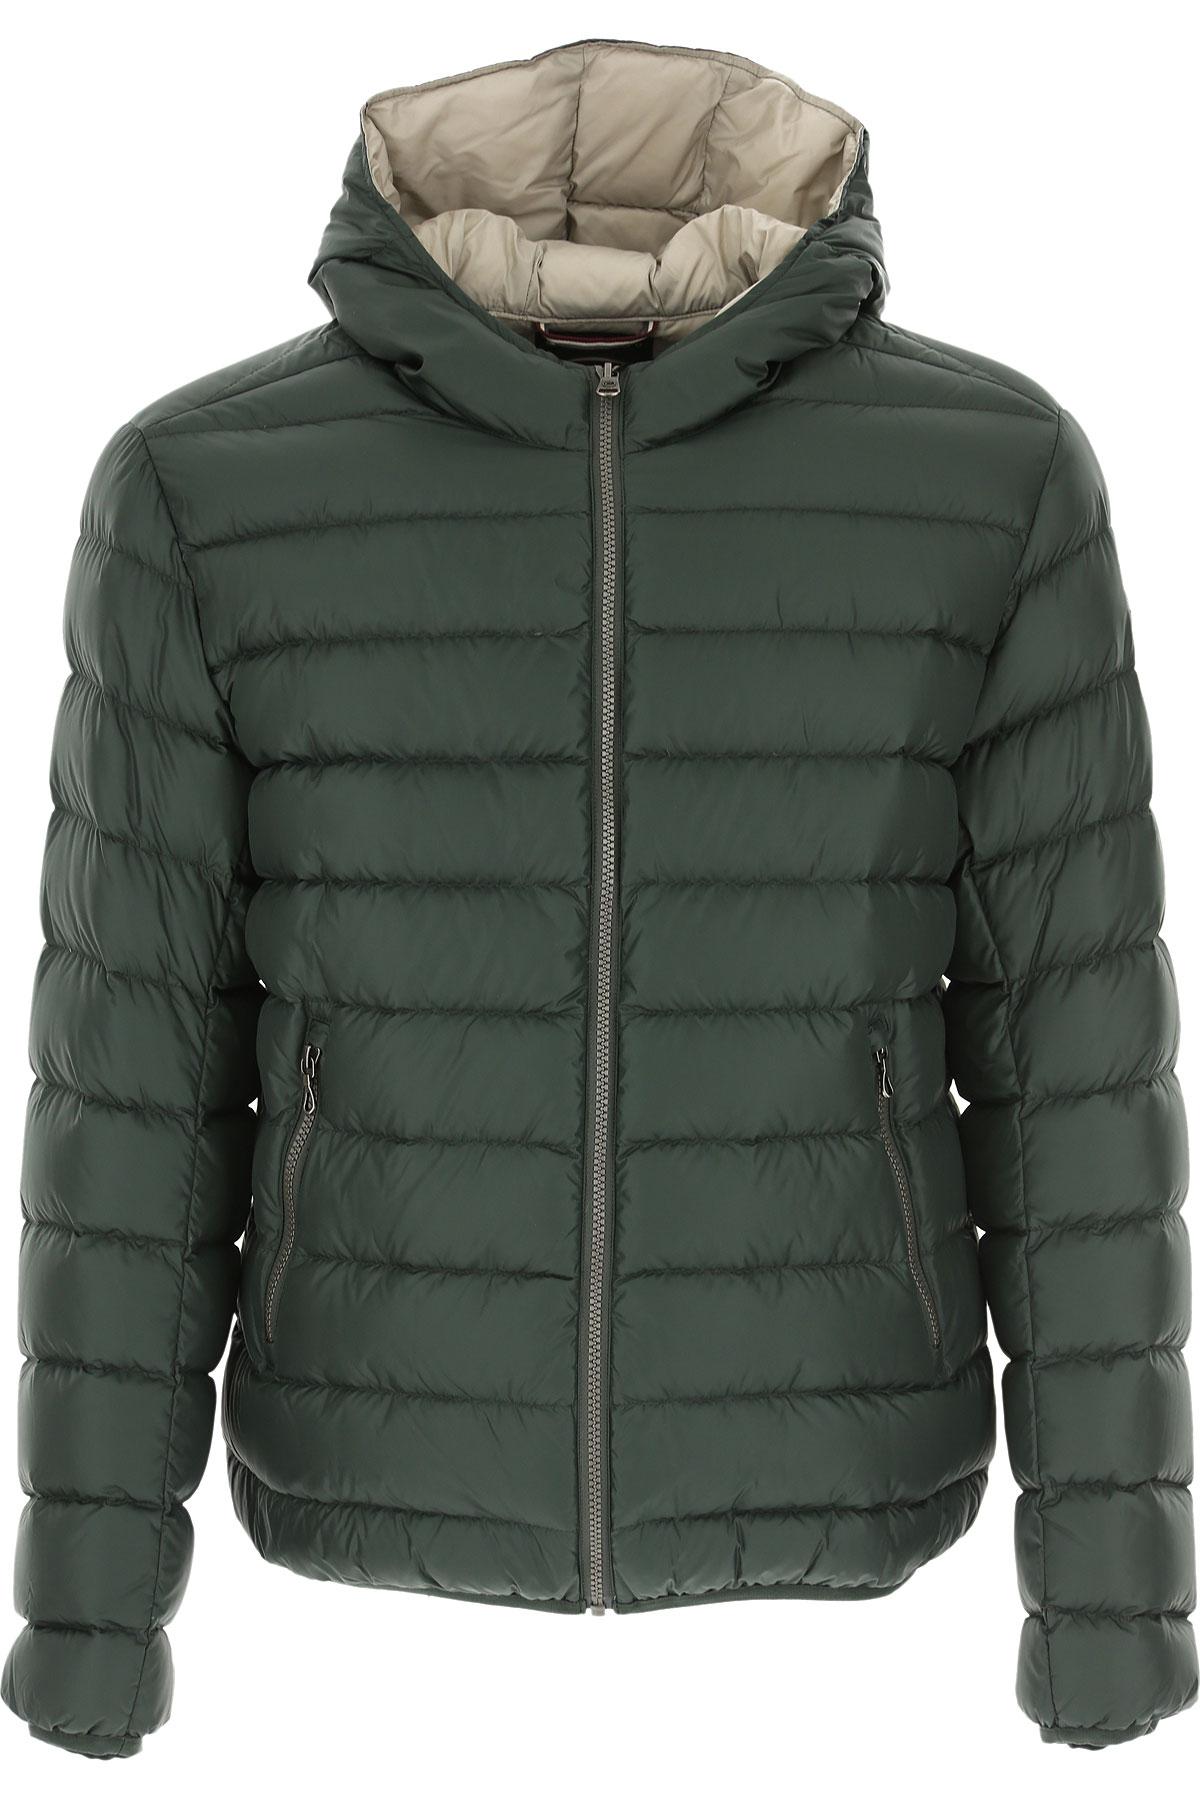 Colmar Down Jacket for Men, Puffer Ski Jacket On Sale, Dark Green, Down, 2019, L M S XL XXL